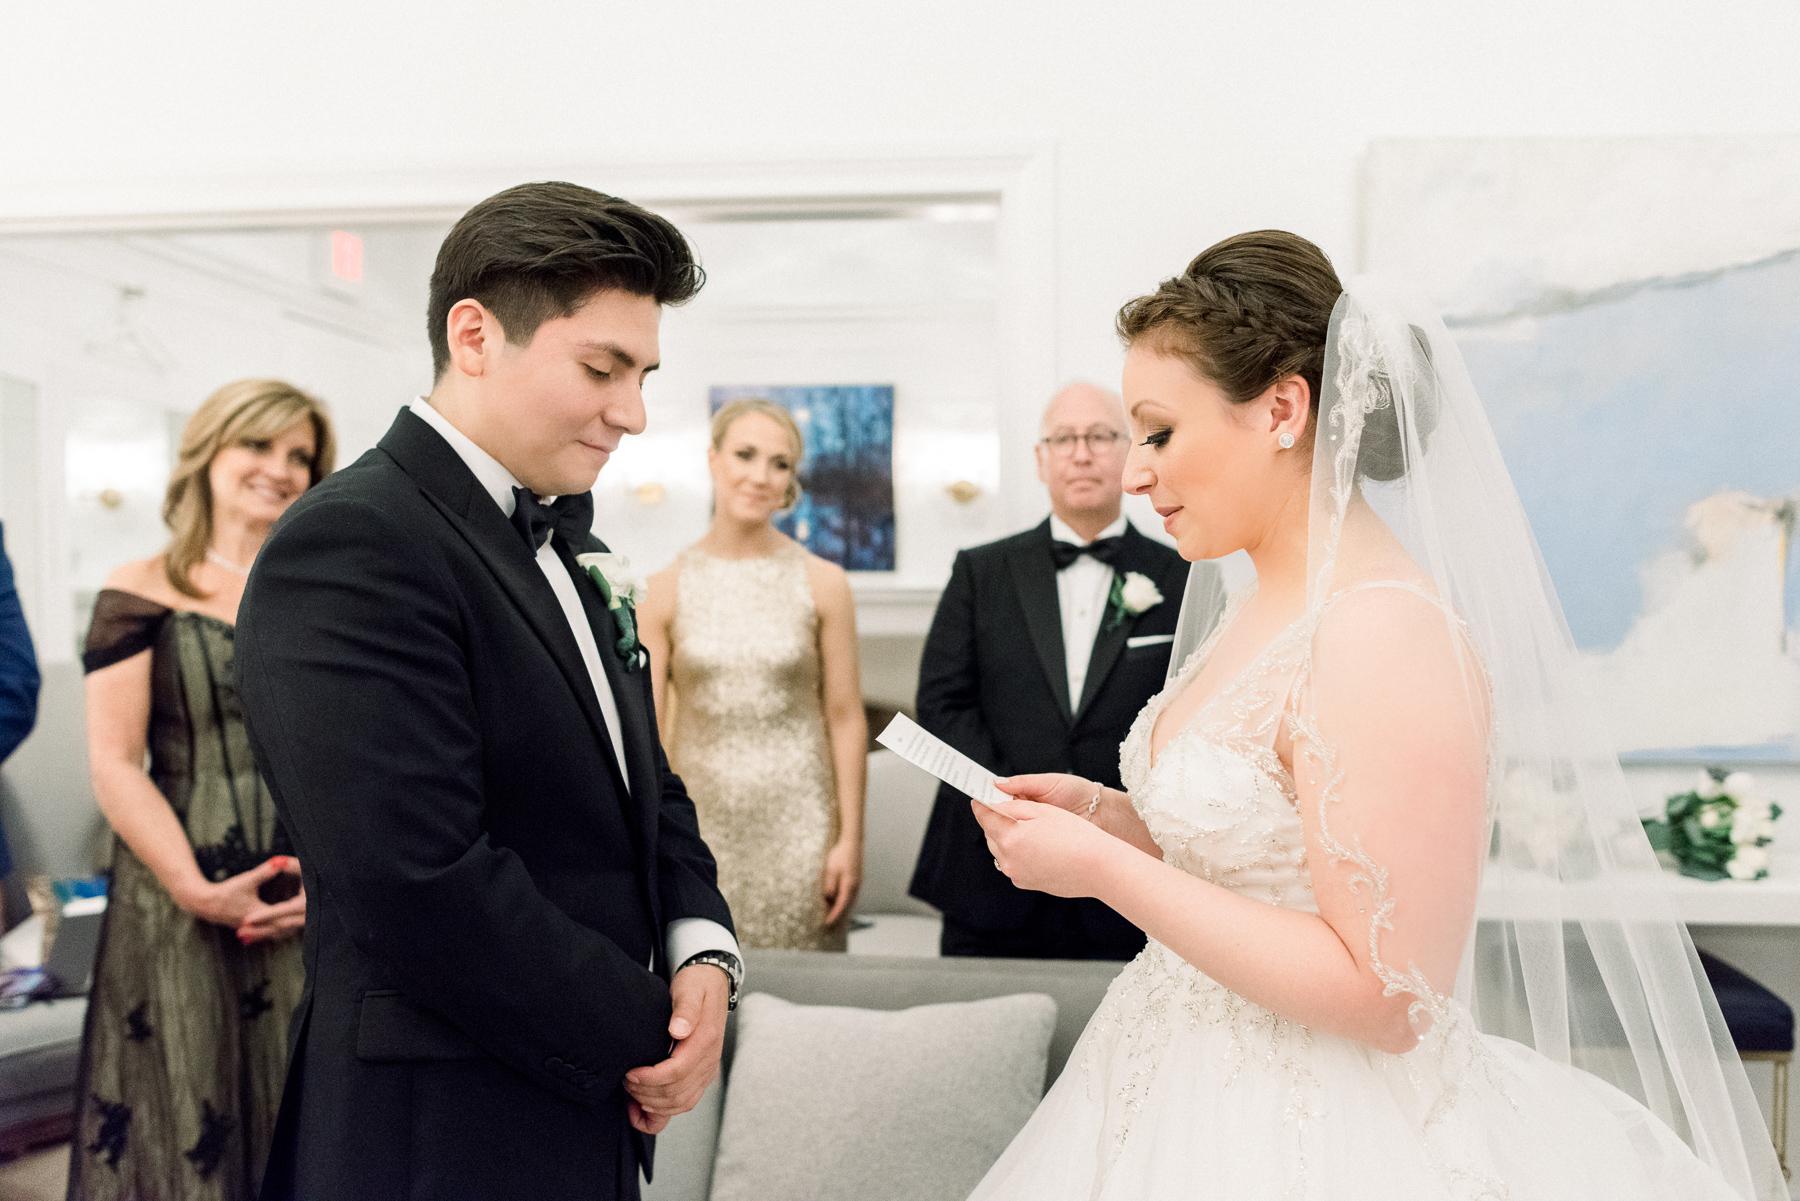 Private Vows at Natirar Mansion